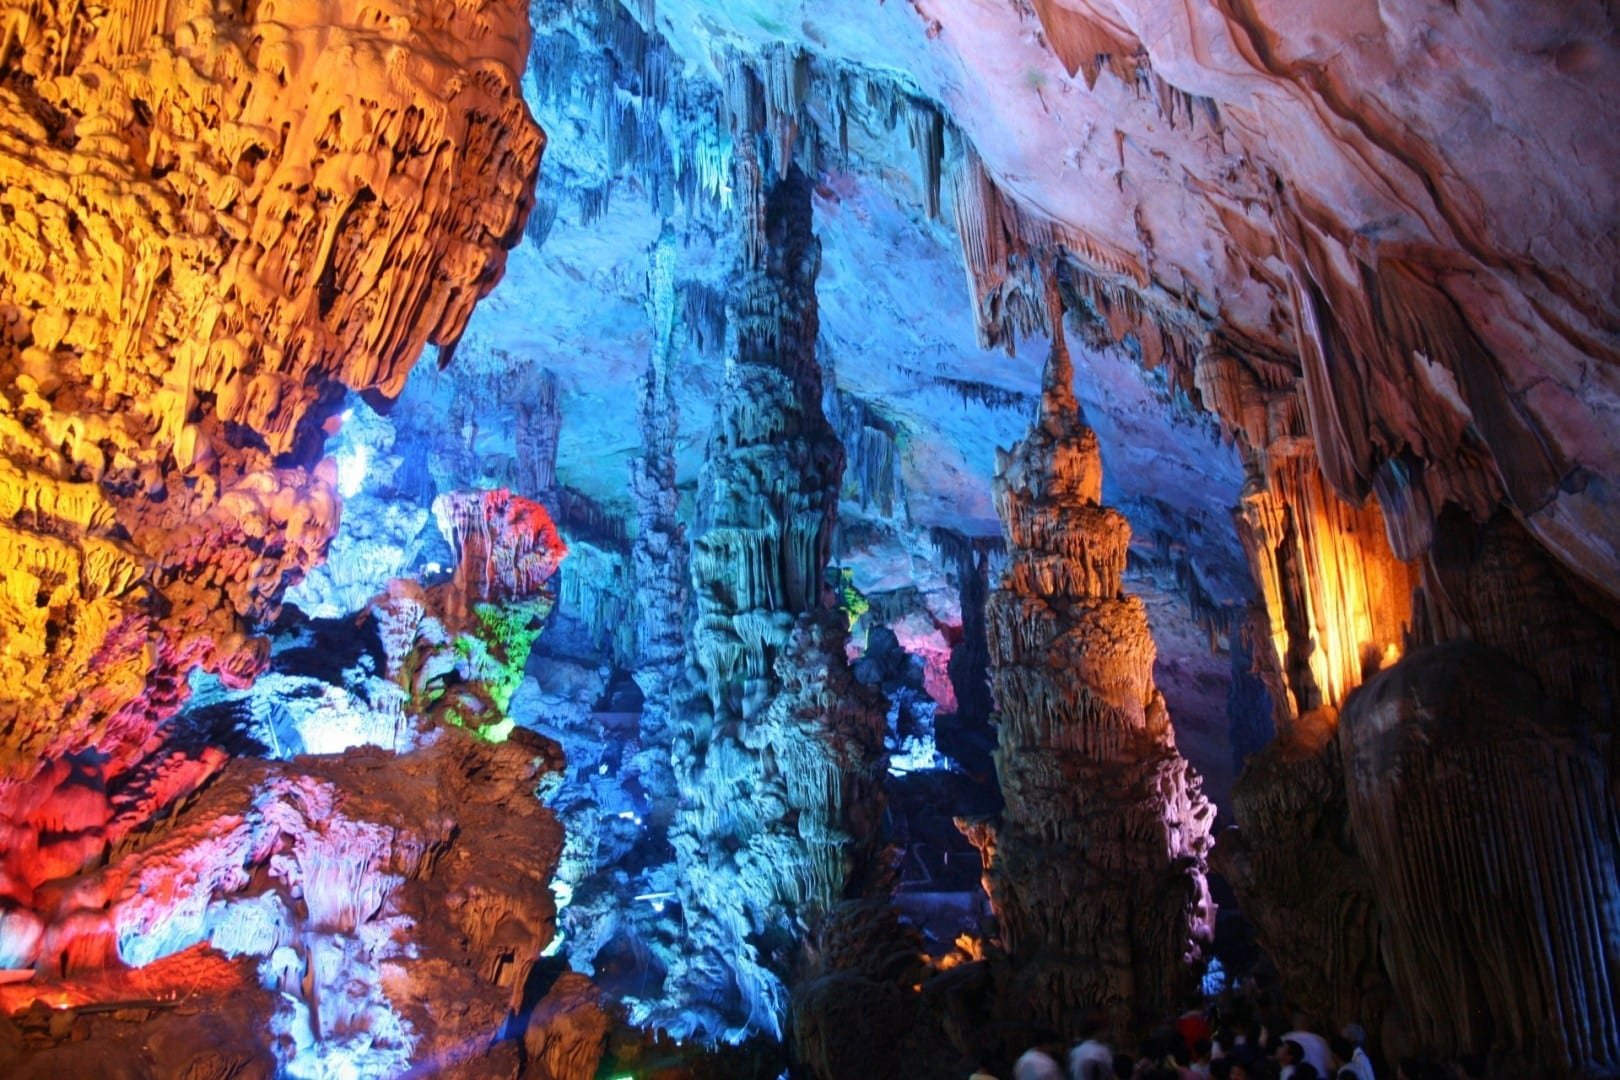 Cueva de la flauta de caña Guilin China